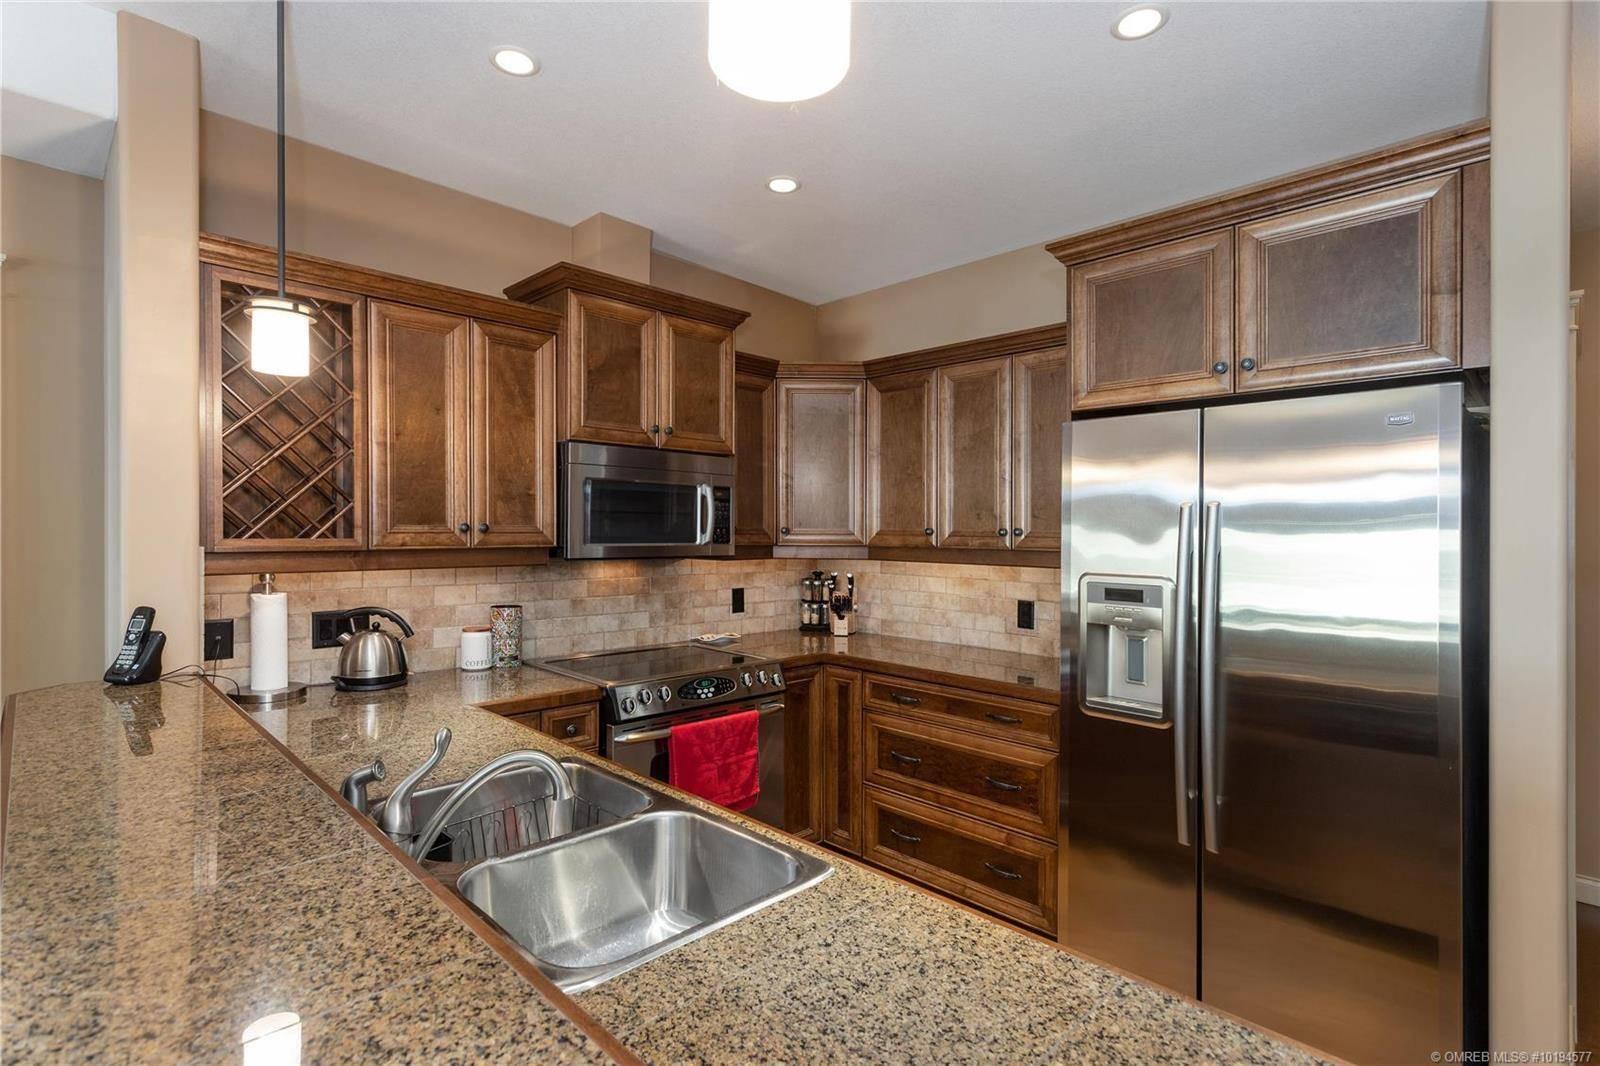 Condo for sale at 2750 Auburn Rd Unit 211 West Kelowna British Columbia - MLS: 10194577